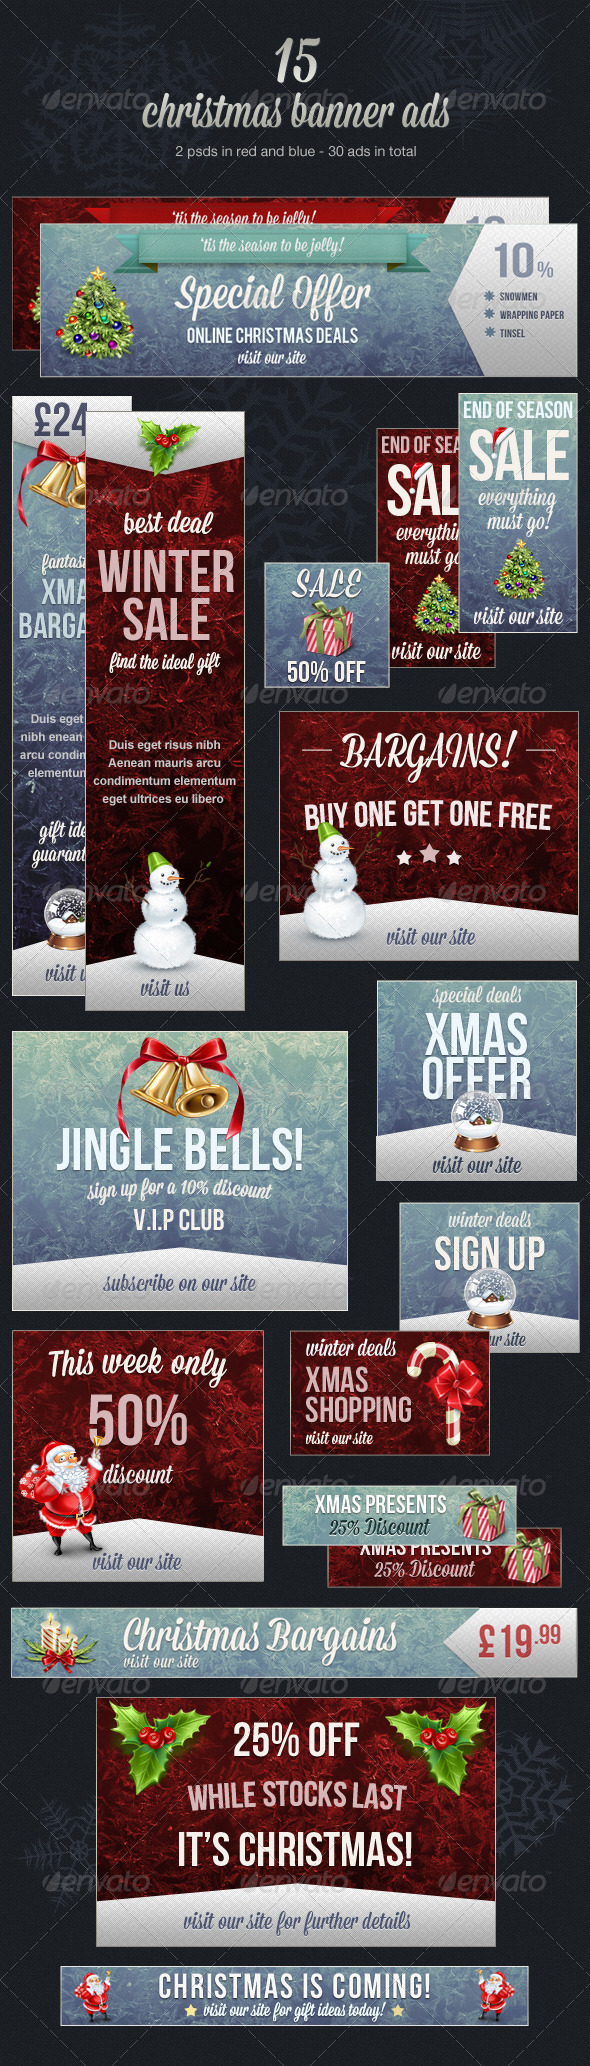 GraphicRiver Christmas Web Banner Ads 3556268